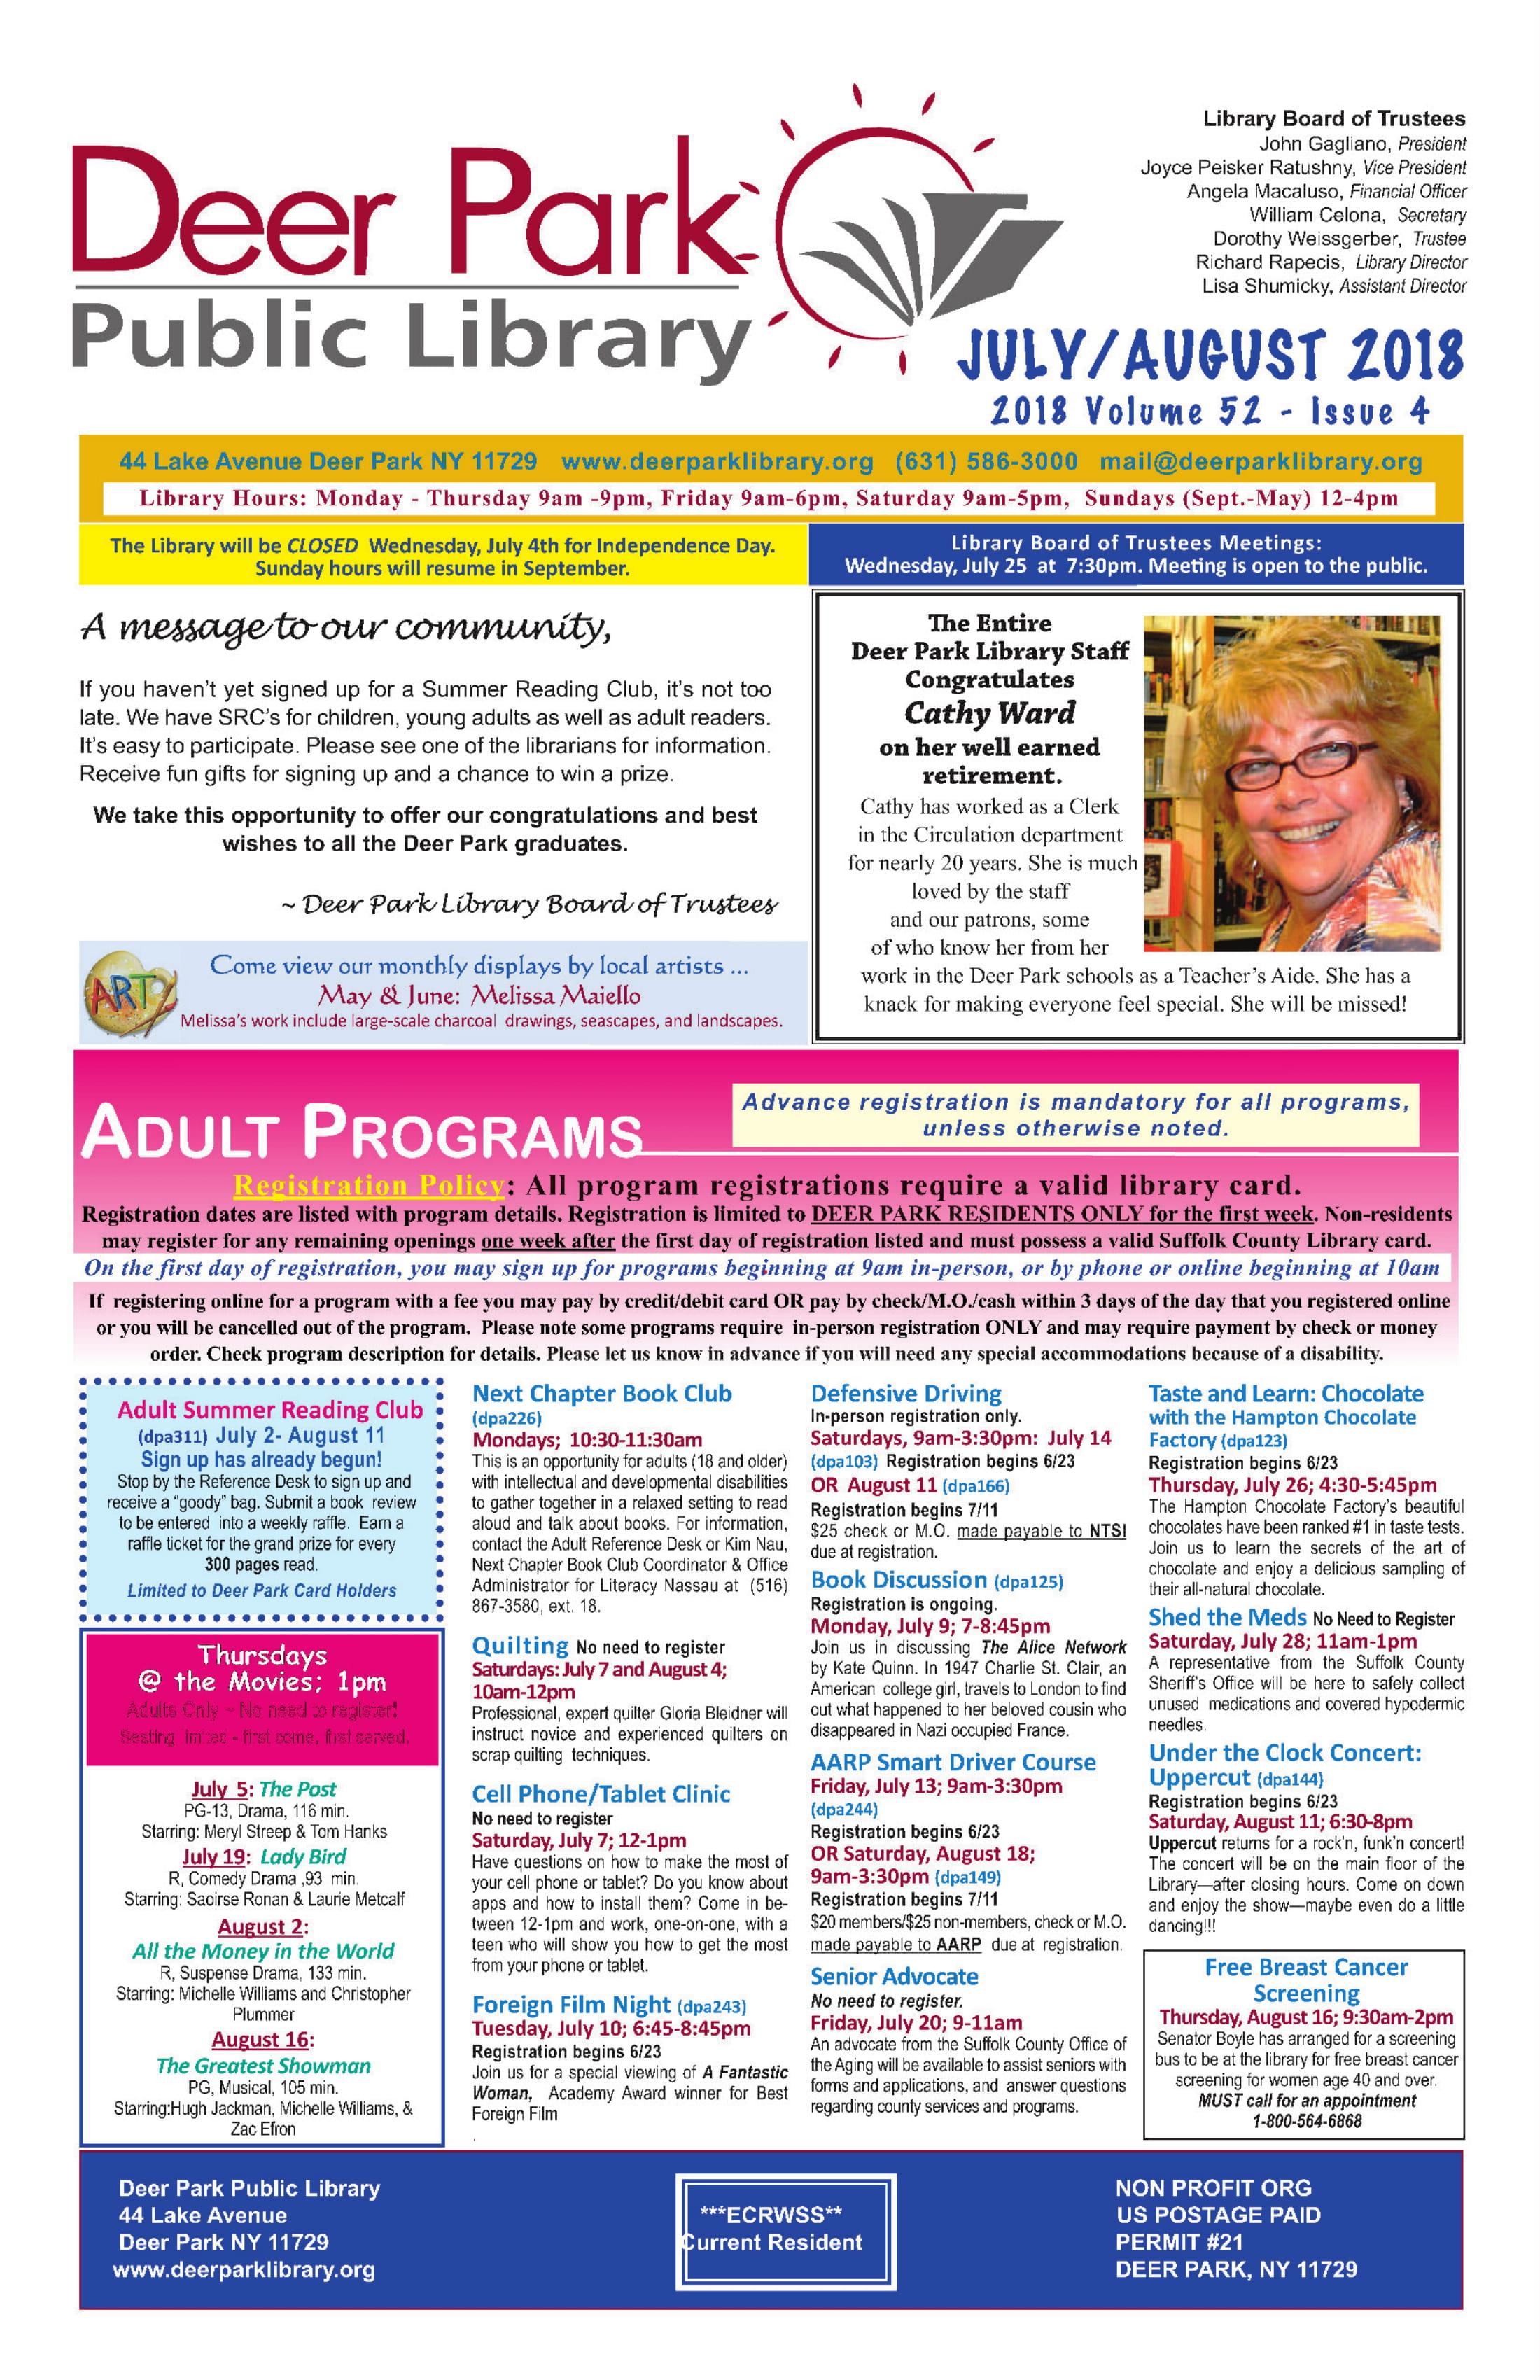 2018 June/July Newsletter 1st Page Image